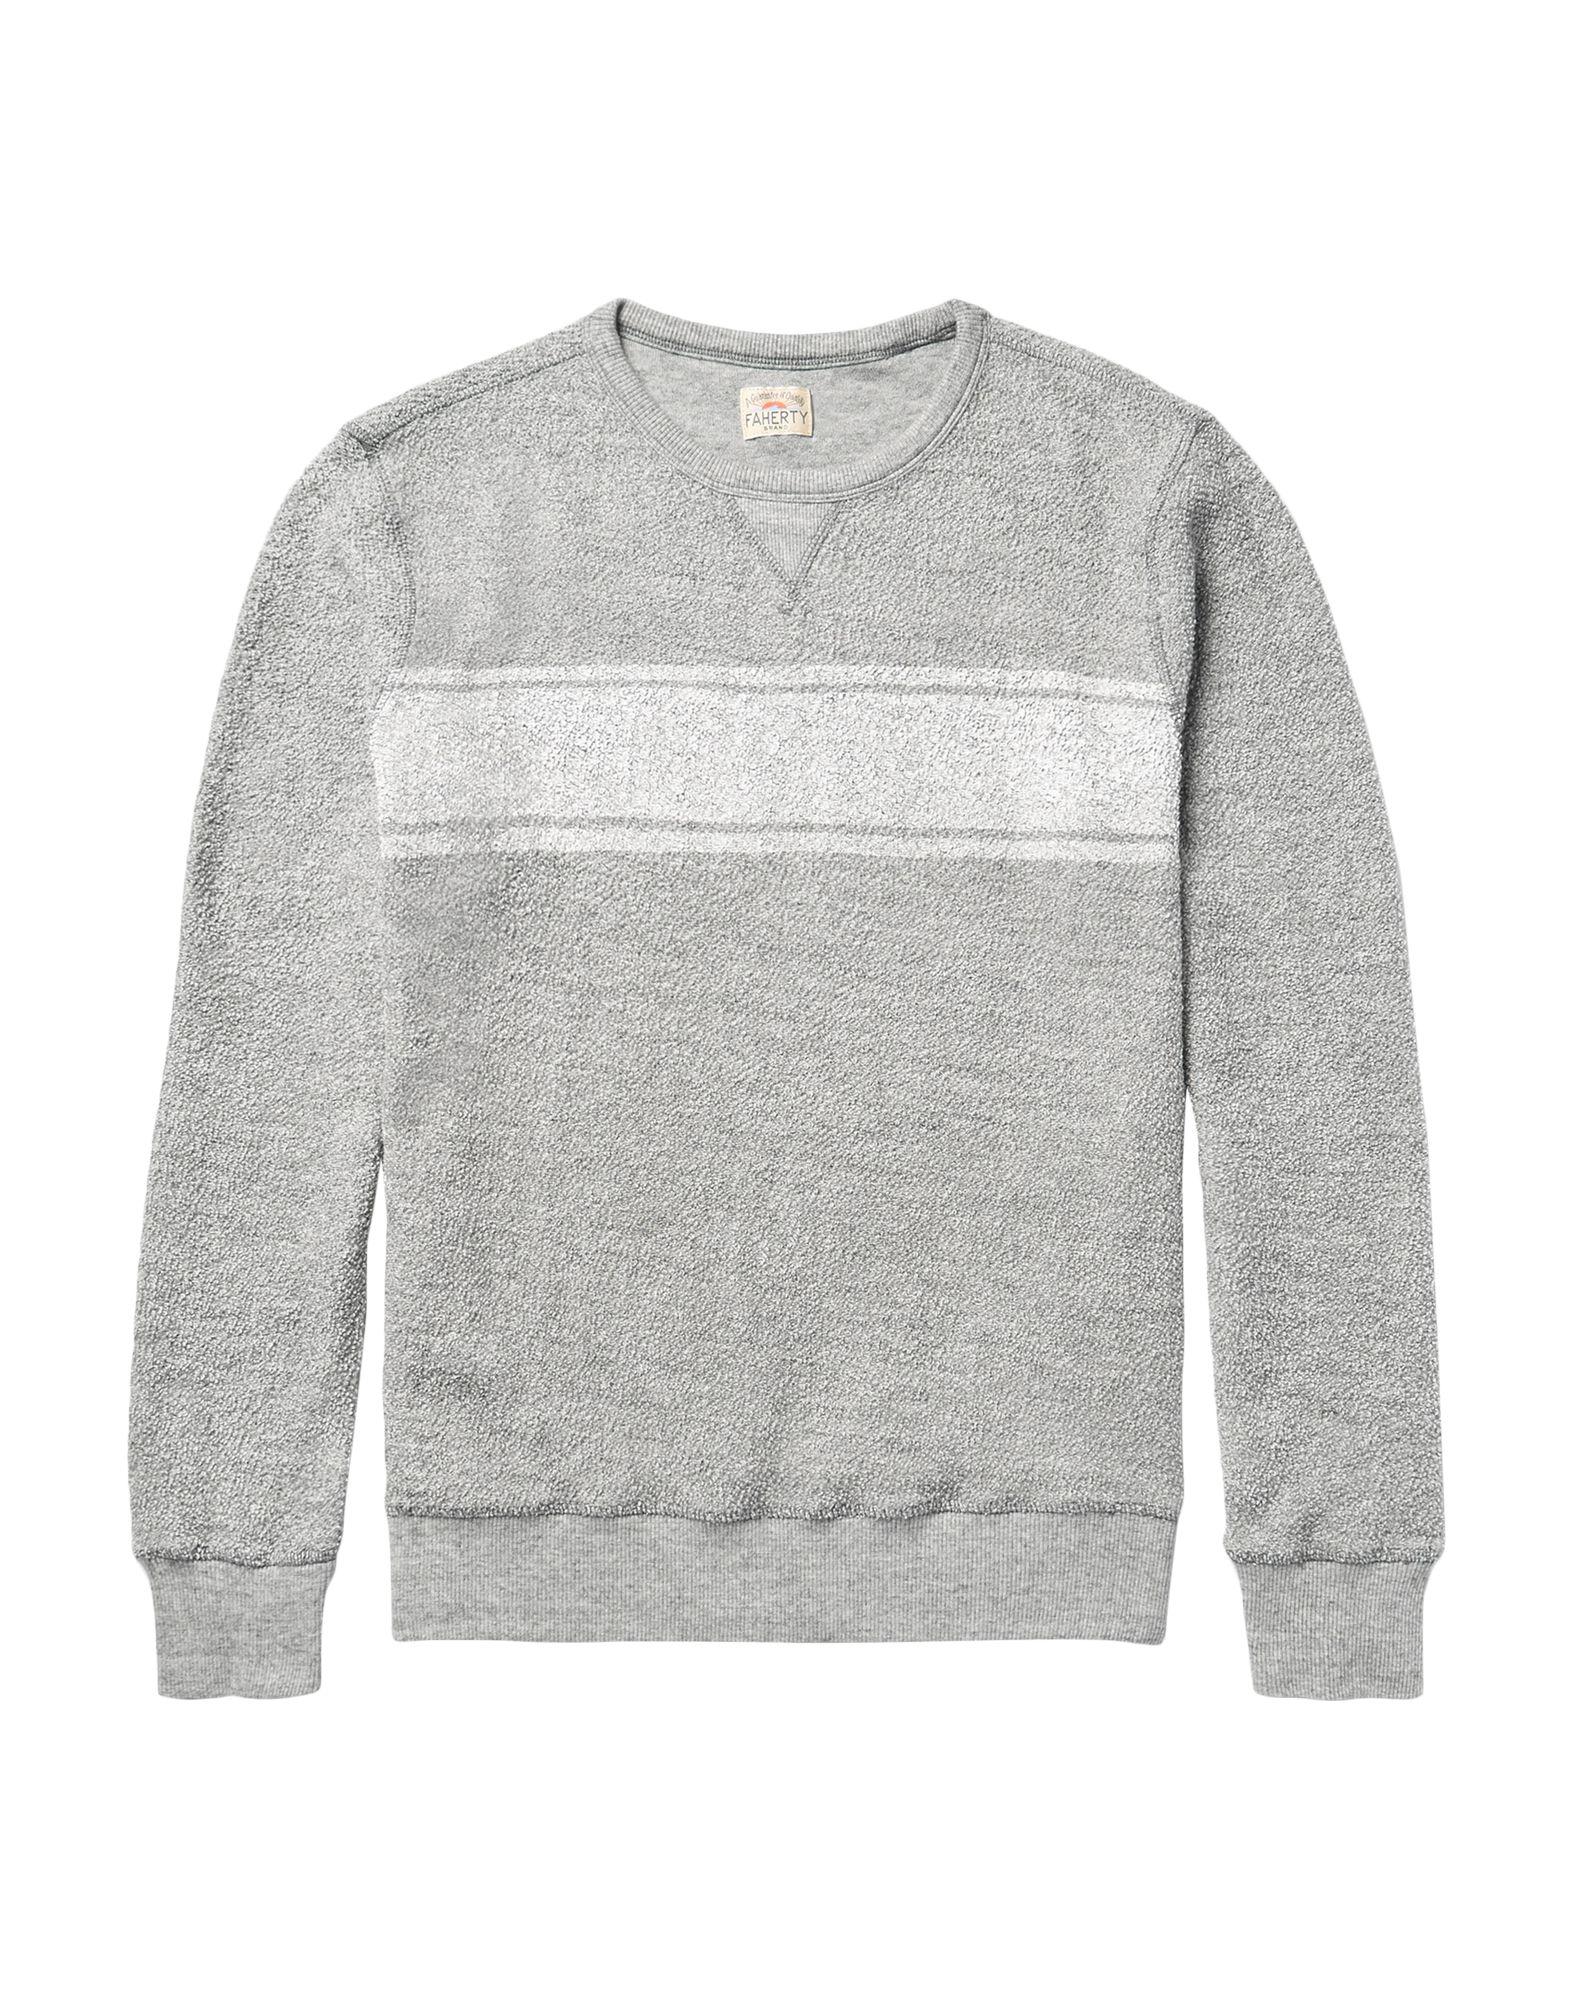 FAHERTY Sweatshirts. logo, print, solid color, long sleeves, round collar, no pockets. 100% Cotton